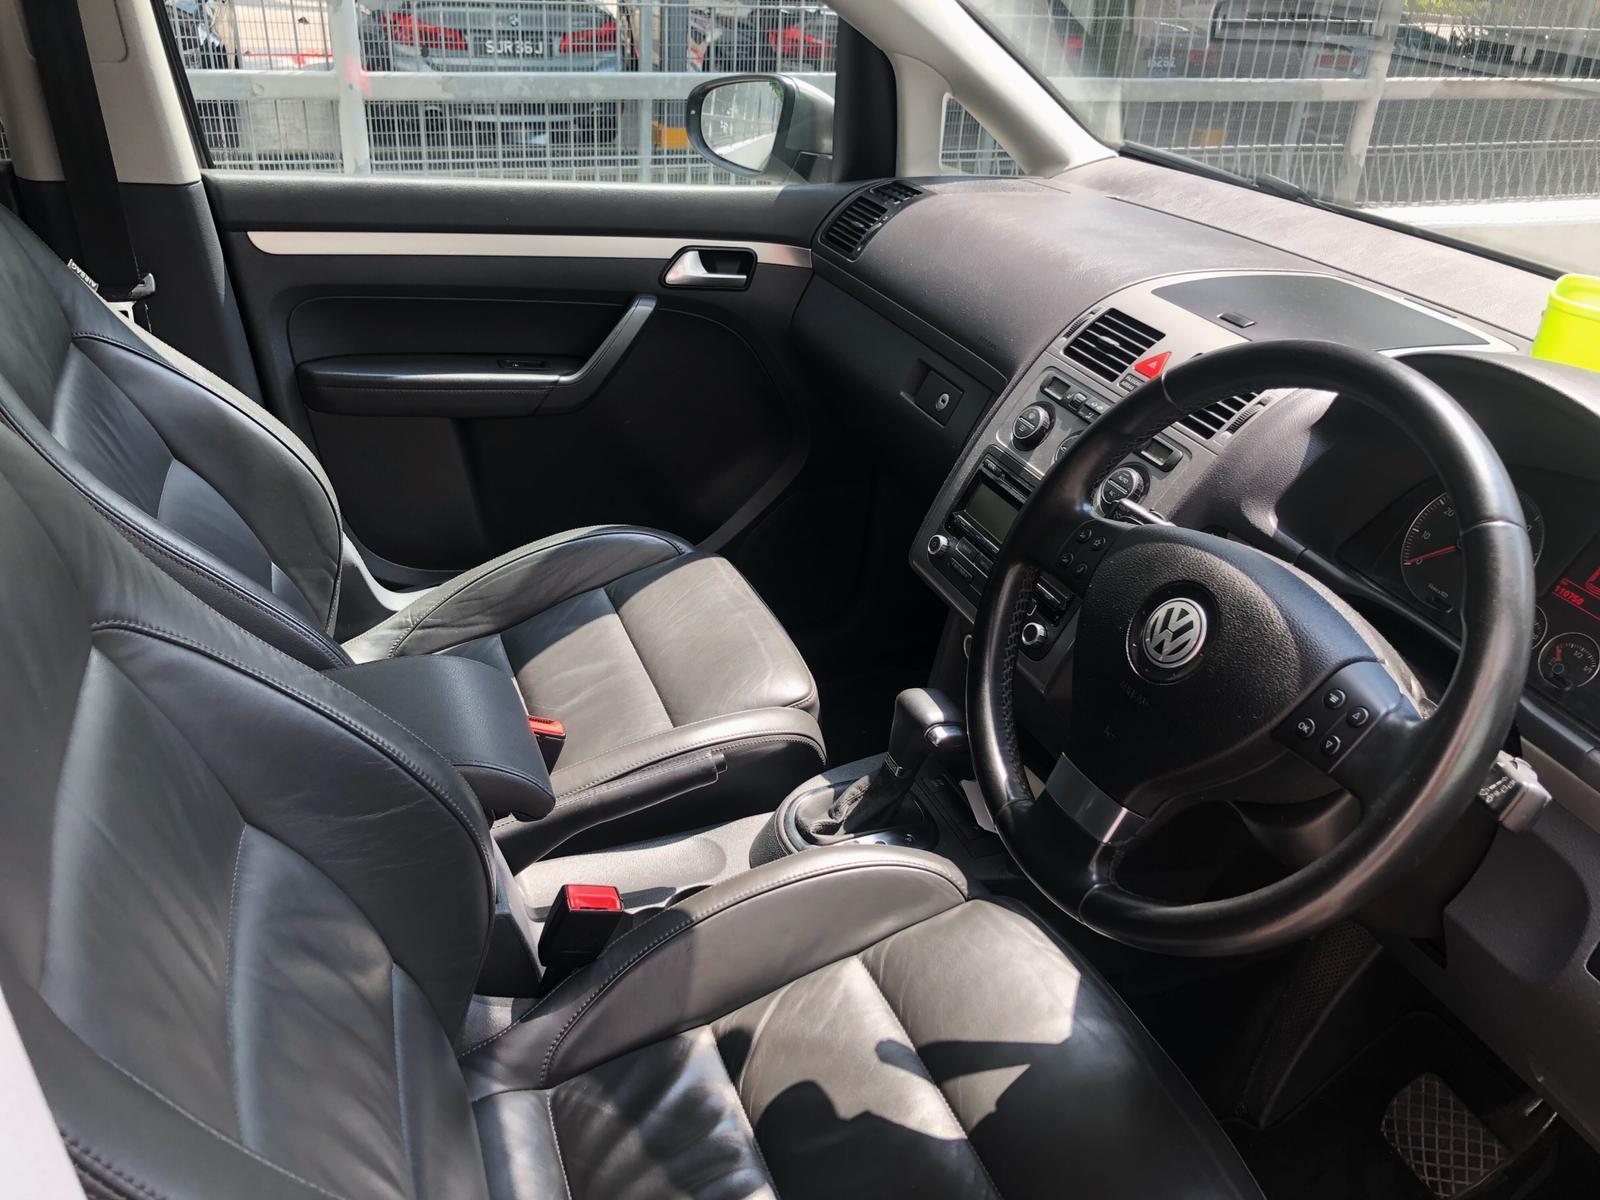 Volkswagen Touran Cheap rental Grab GoJek or Personal Use